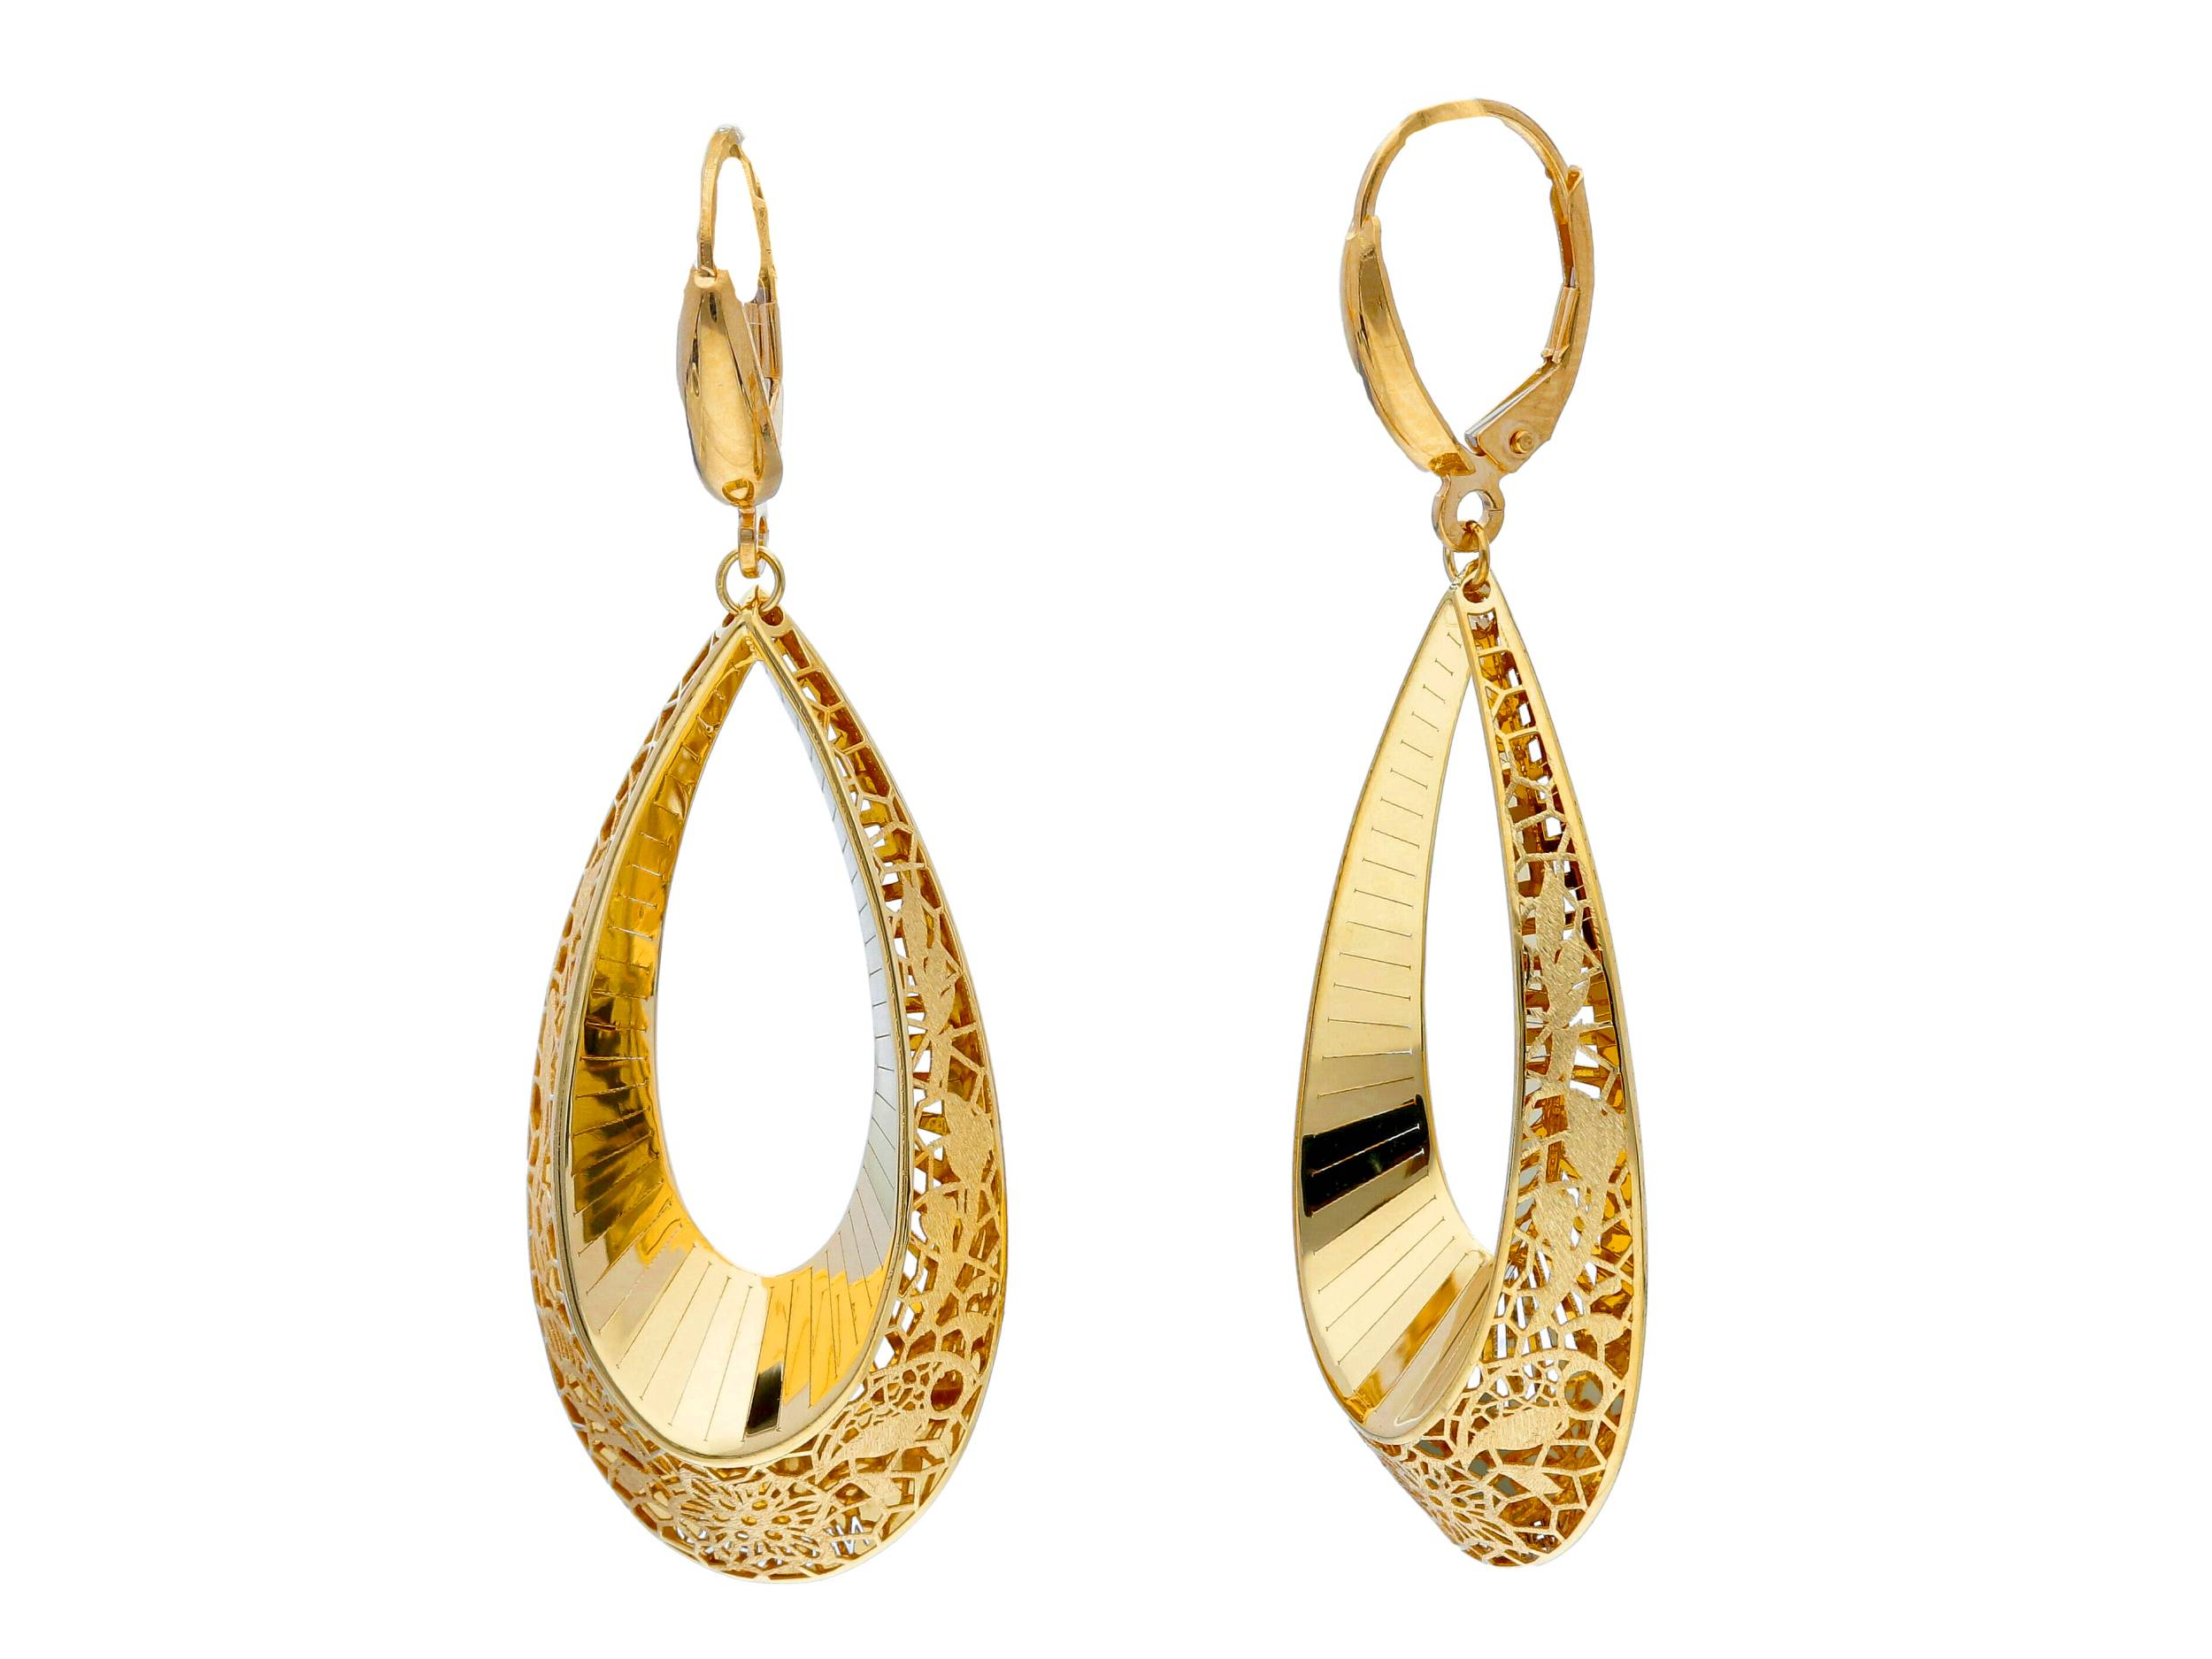 Beautiful 18ct Yellow Gold Lever Back Pendant Earrings